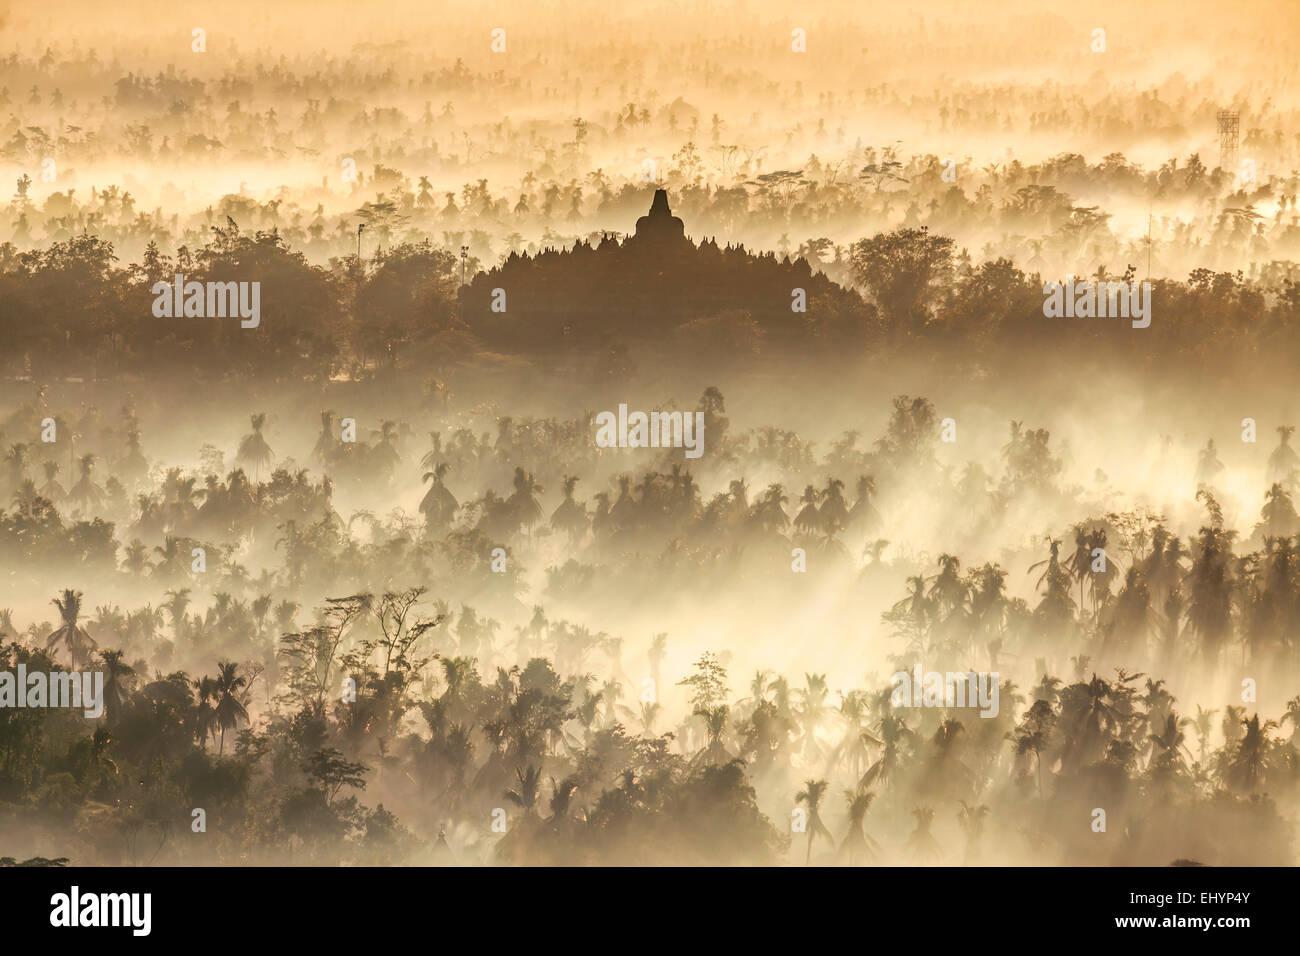 Borobudur Temple at sunrise, Central Java, Indonesia - Stock Image